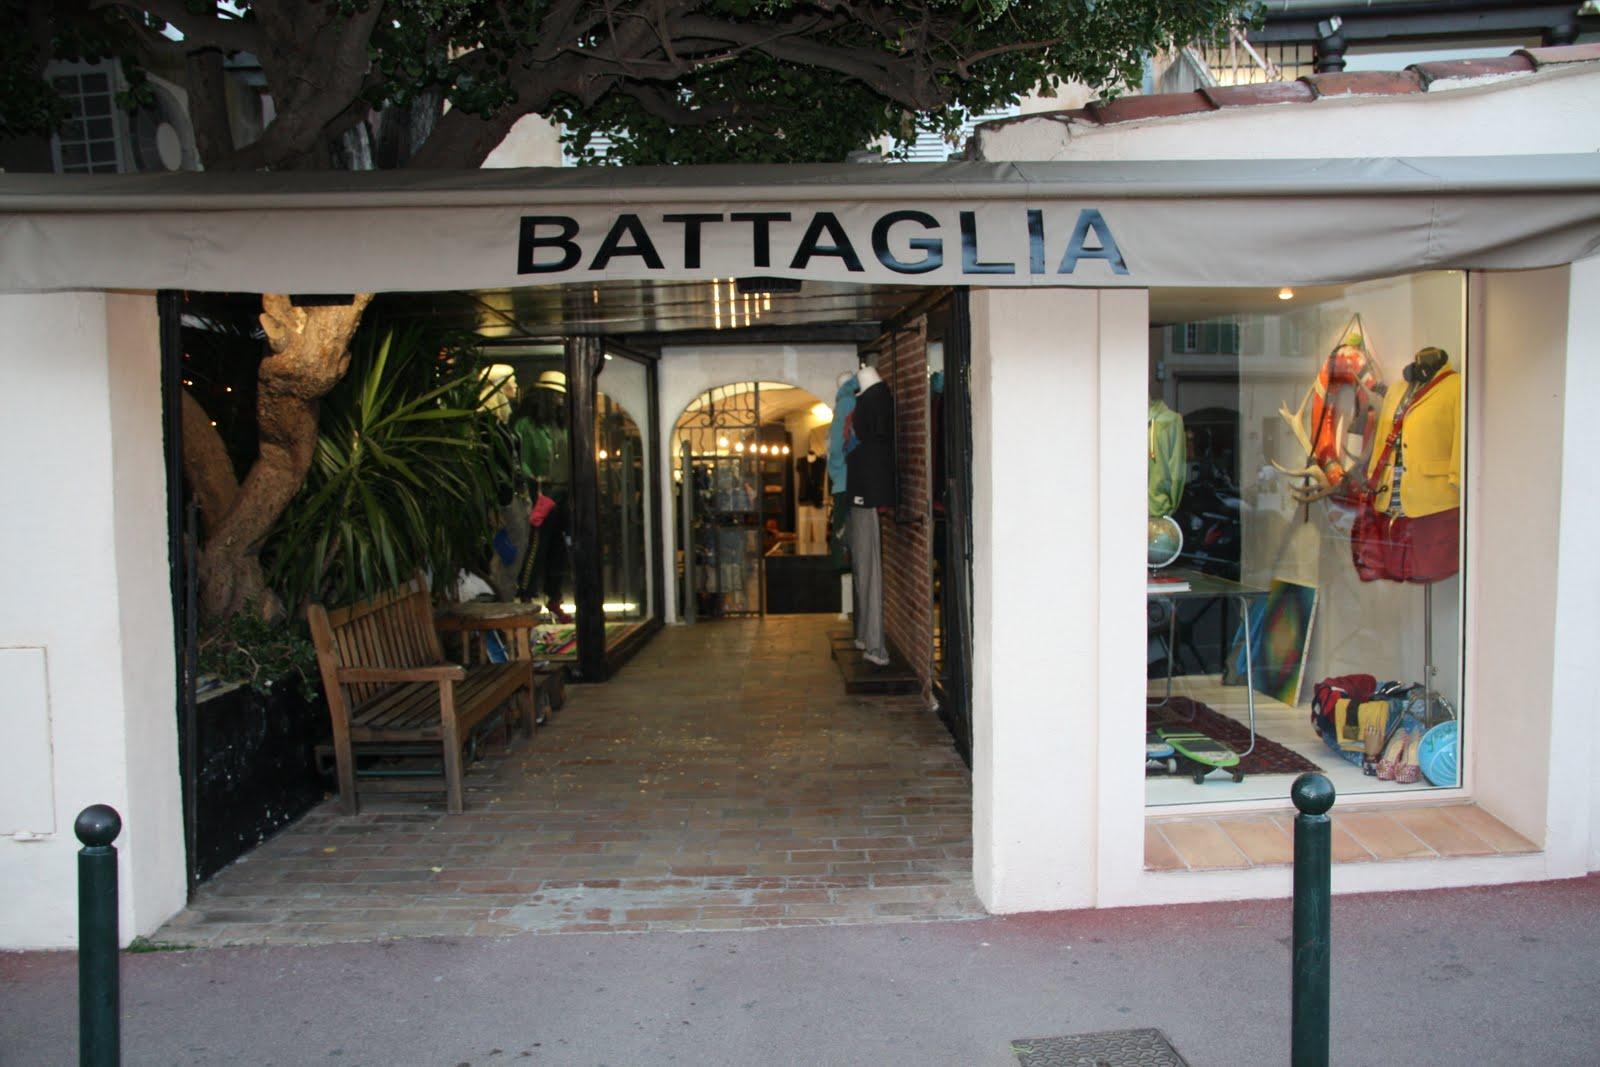 Battaglia Saint Tropez France